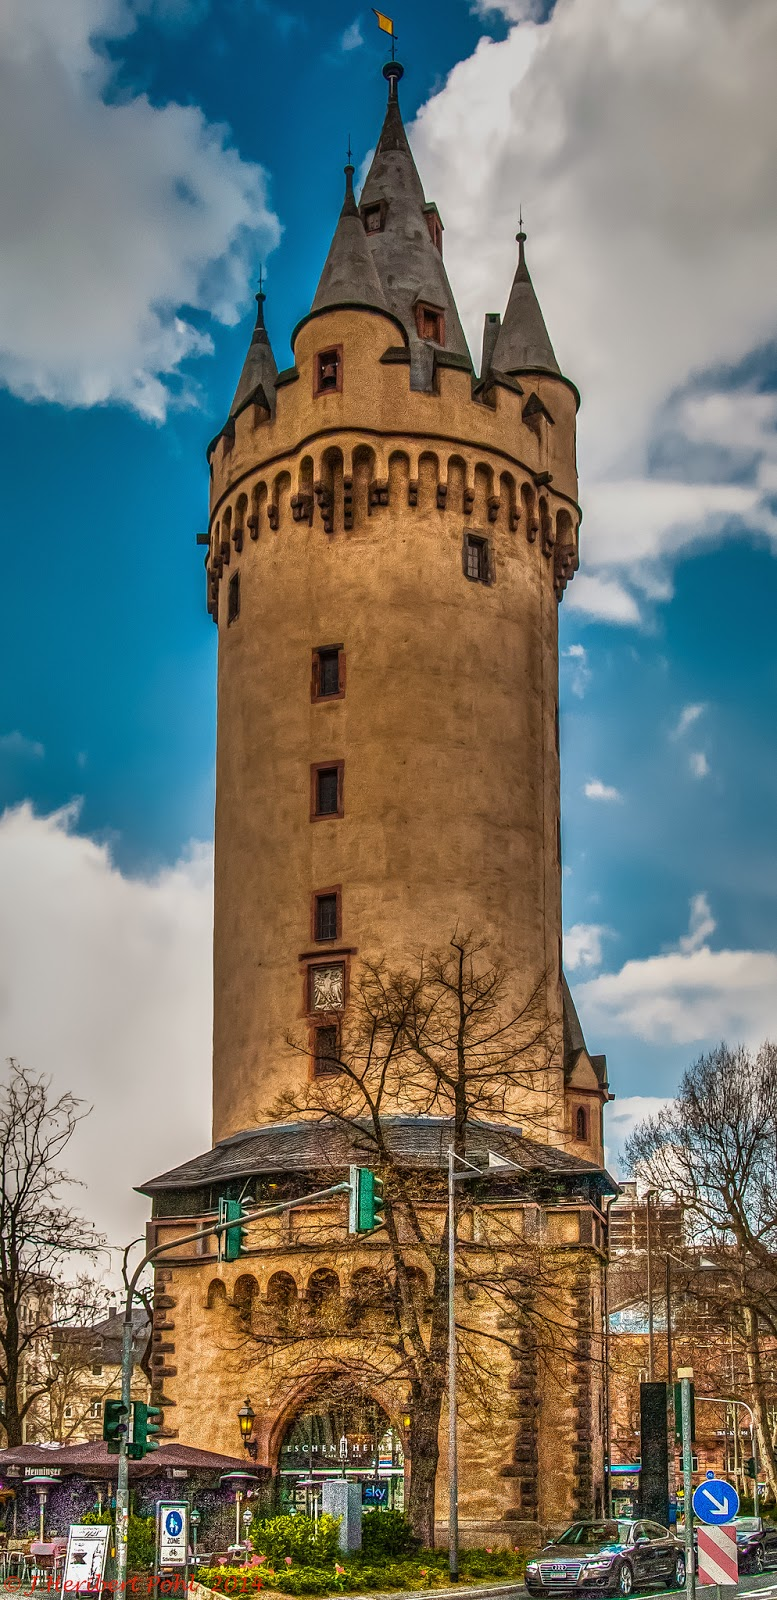 Eschenheim Tower, Germany